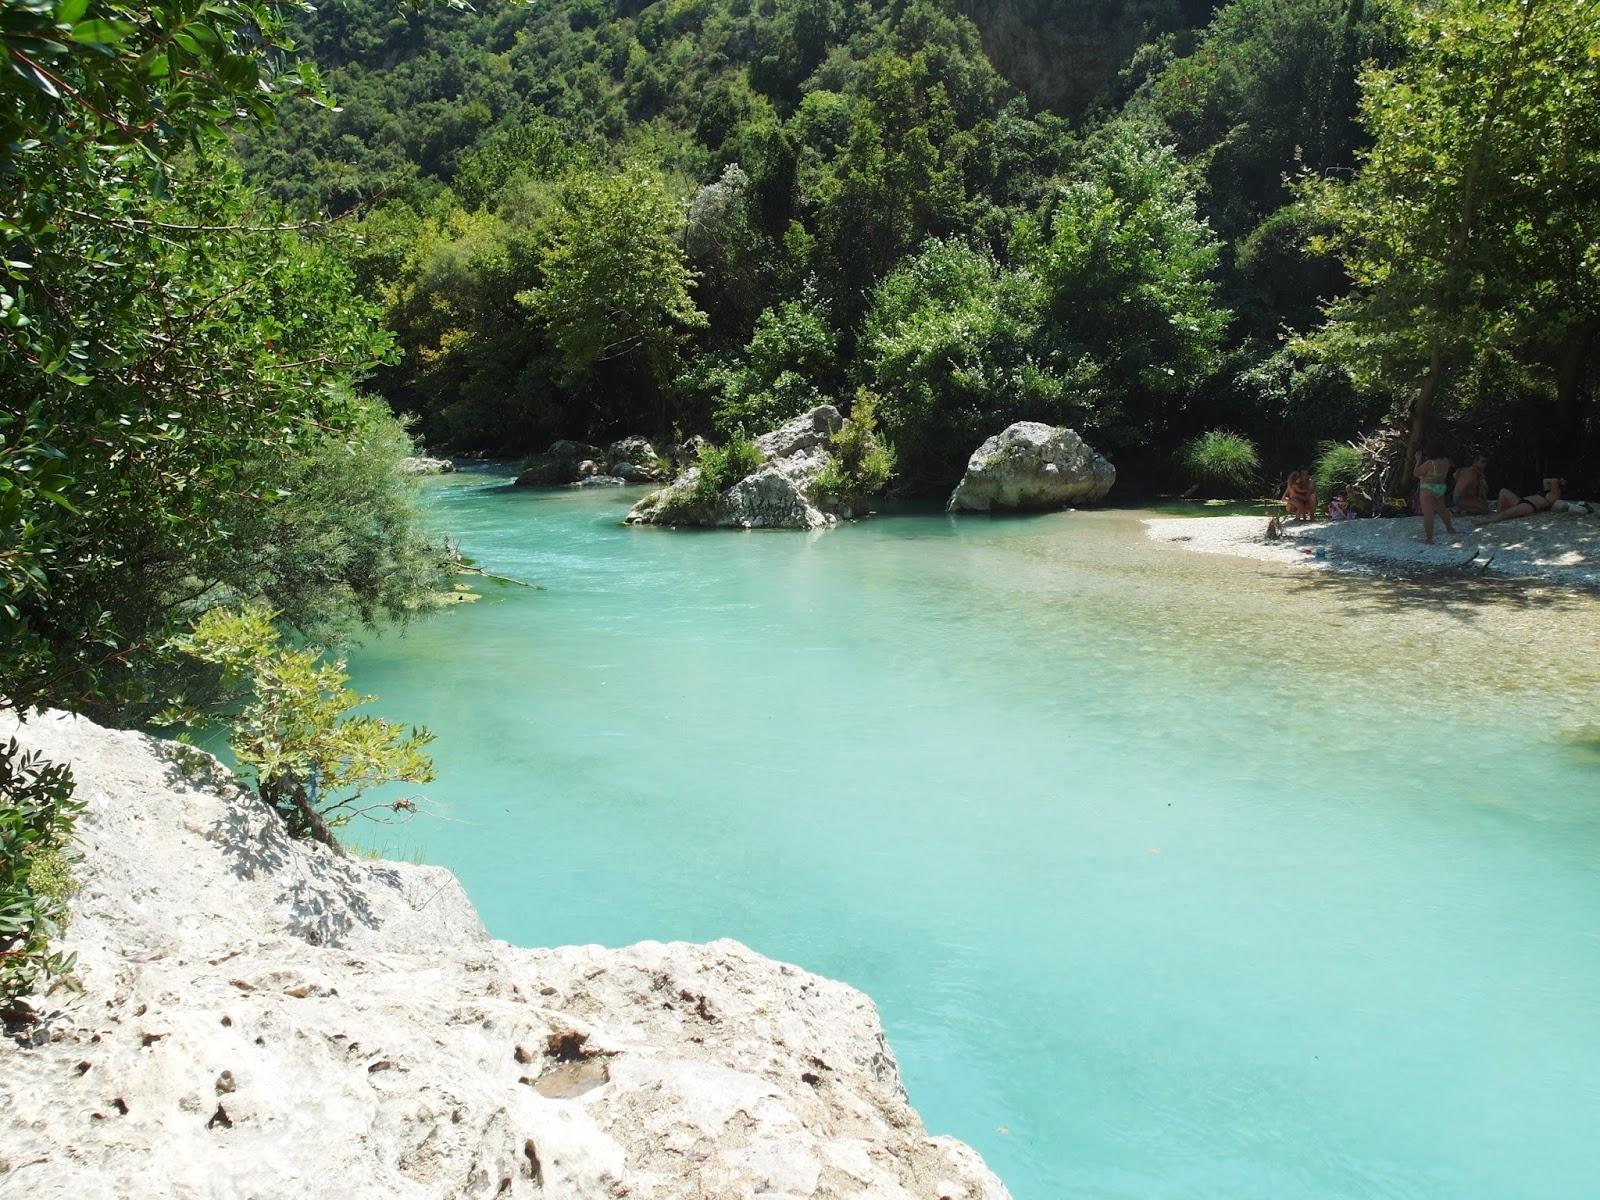 posvátná řeka Acheron v Gliki Řecko